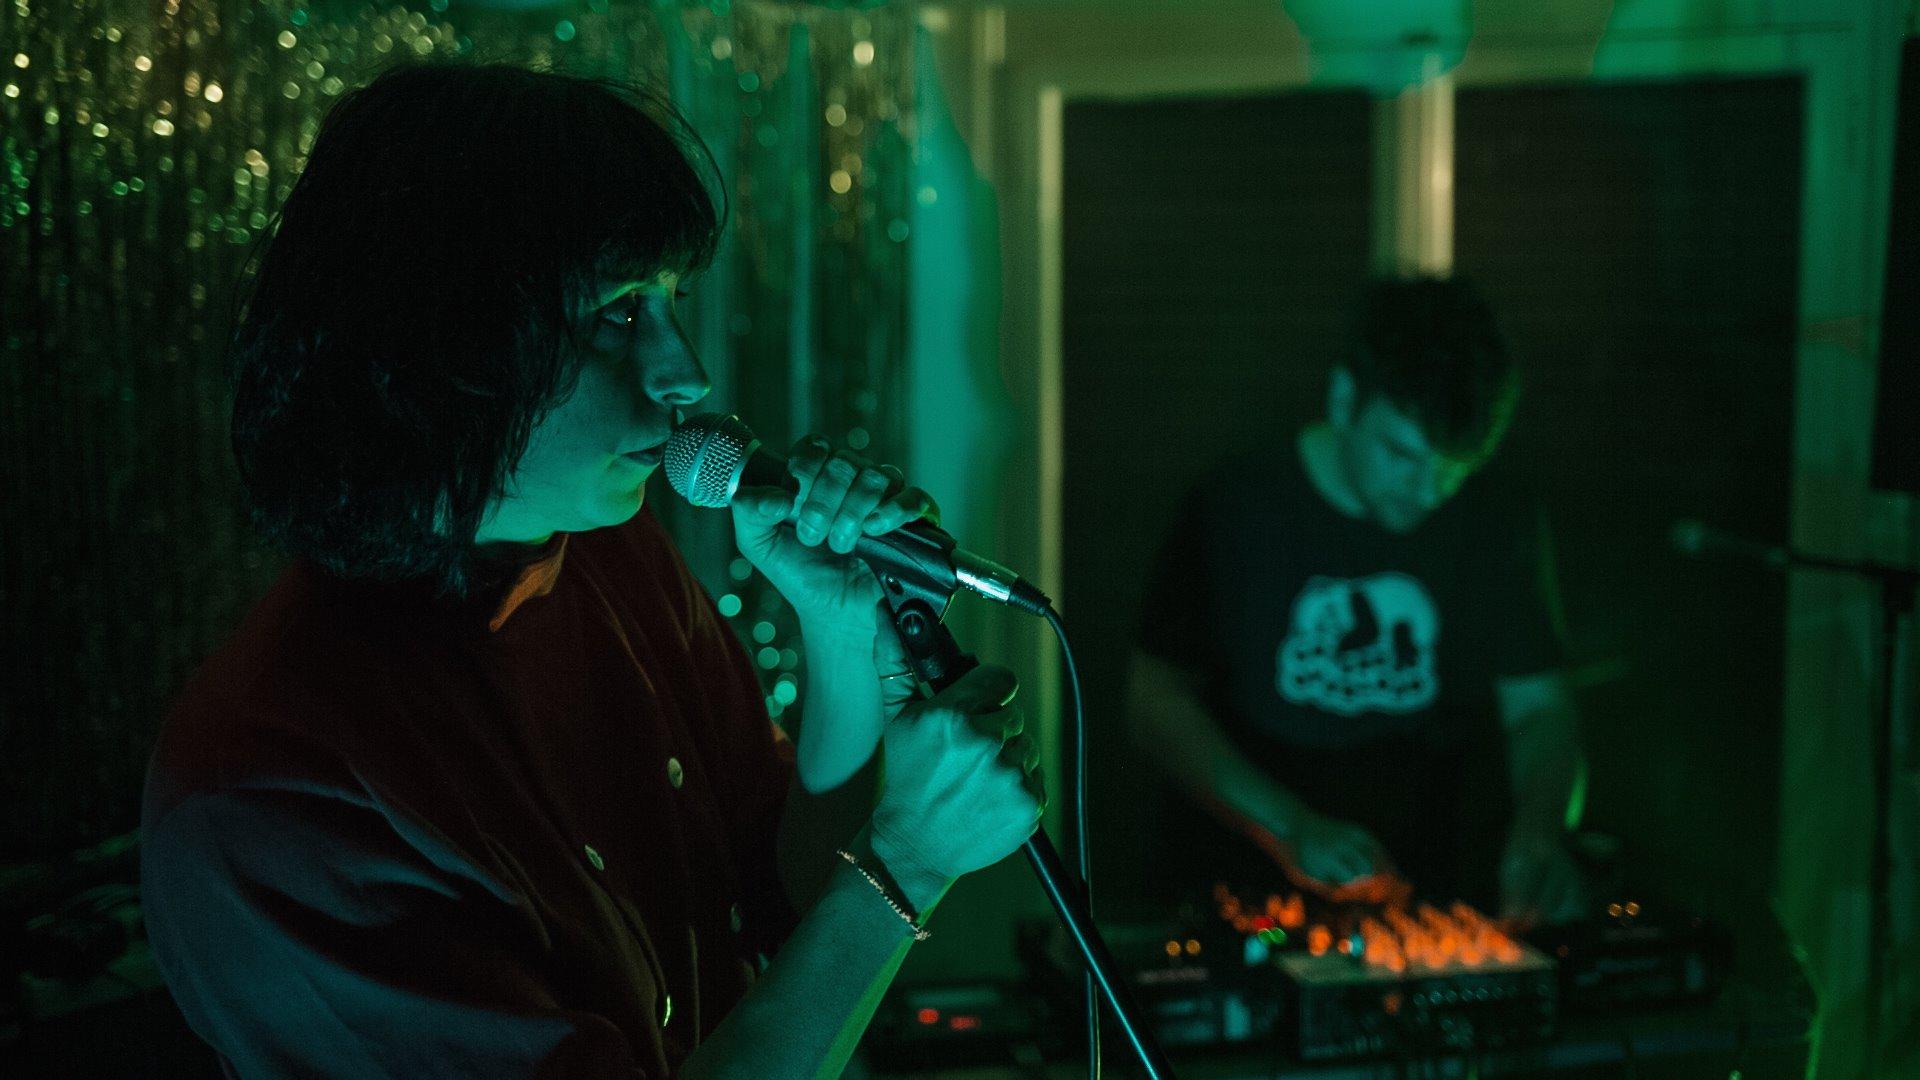 stella-nteibint-man-duo-echo-canyon-live-velvet-room-athens-09